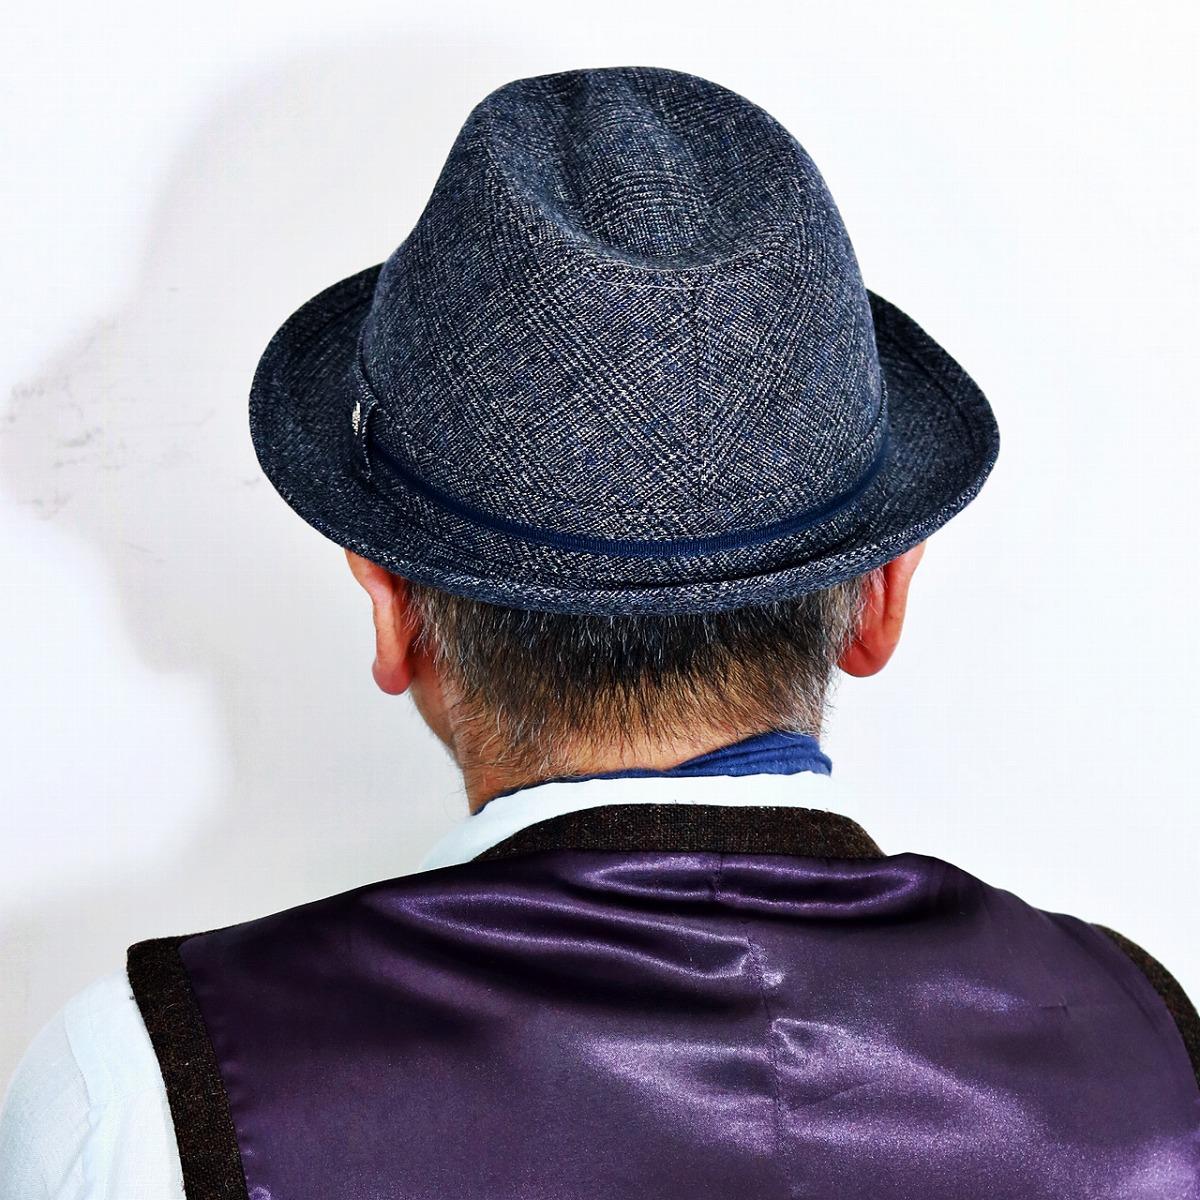 d955fcebc8aa2 Dark blue navy  fedora  Respect for the Aged Day gift birthday Christmas  present hat mail order made in DAKS men hat hat glen check Daks soft felt hat  hat ...